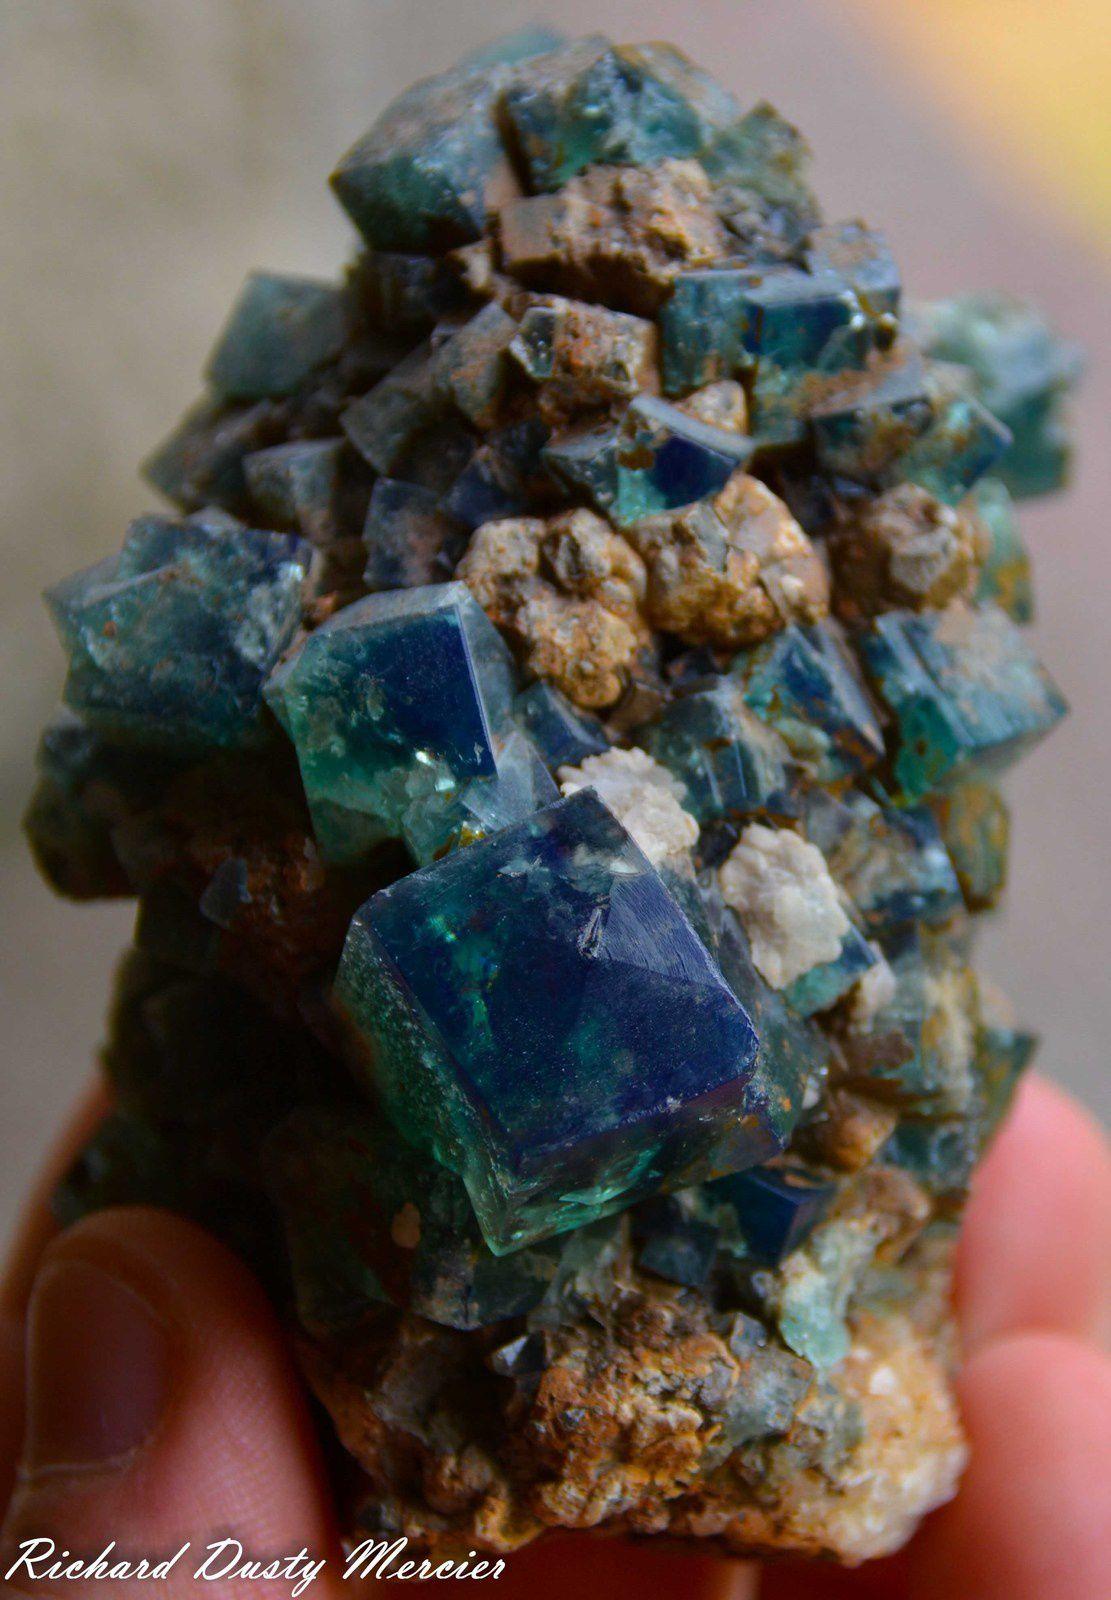 Fluorite (Fluorine) from Rogerley mine, Durham, UK (GB) (size: Small cabinet)